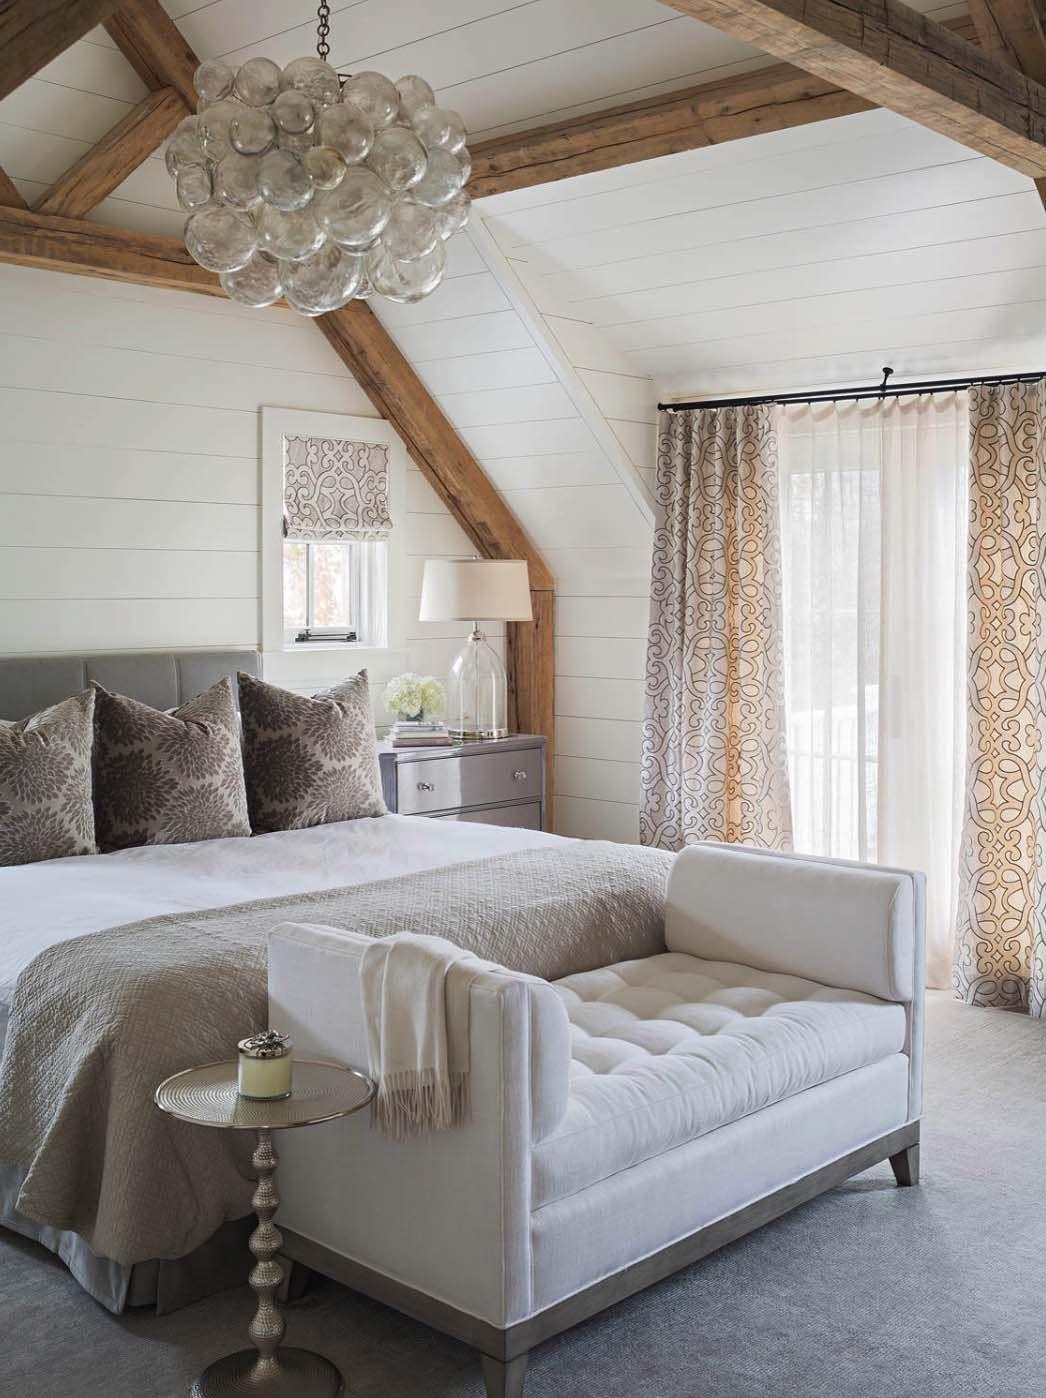 33 Stunning Master Bedroom Retreats With Vaulted Ceilings Elegant Master Bedroom Feature Wall Bedroom Home Bedroom